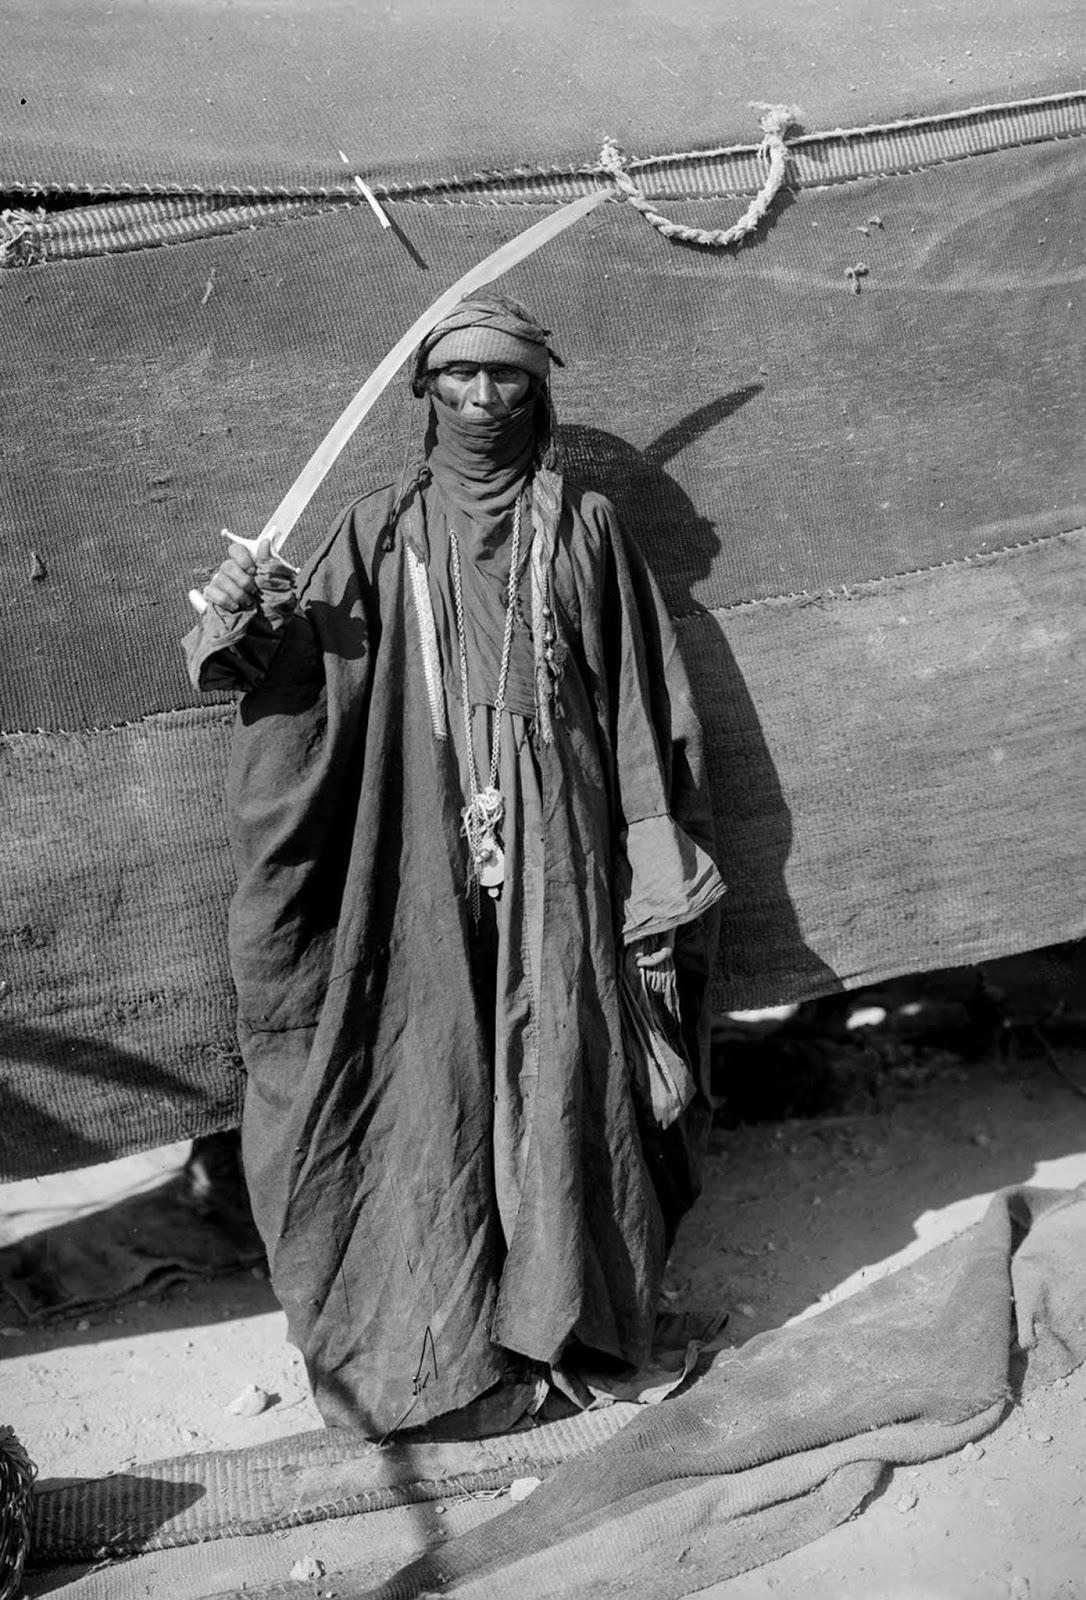 A Bedouin man showing his sword.